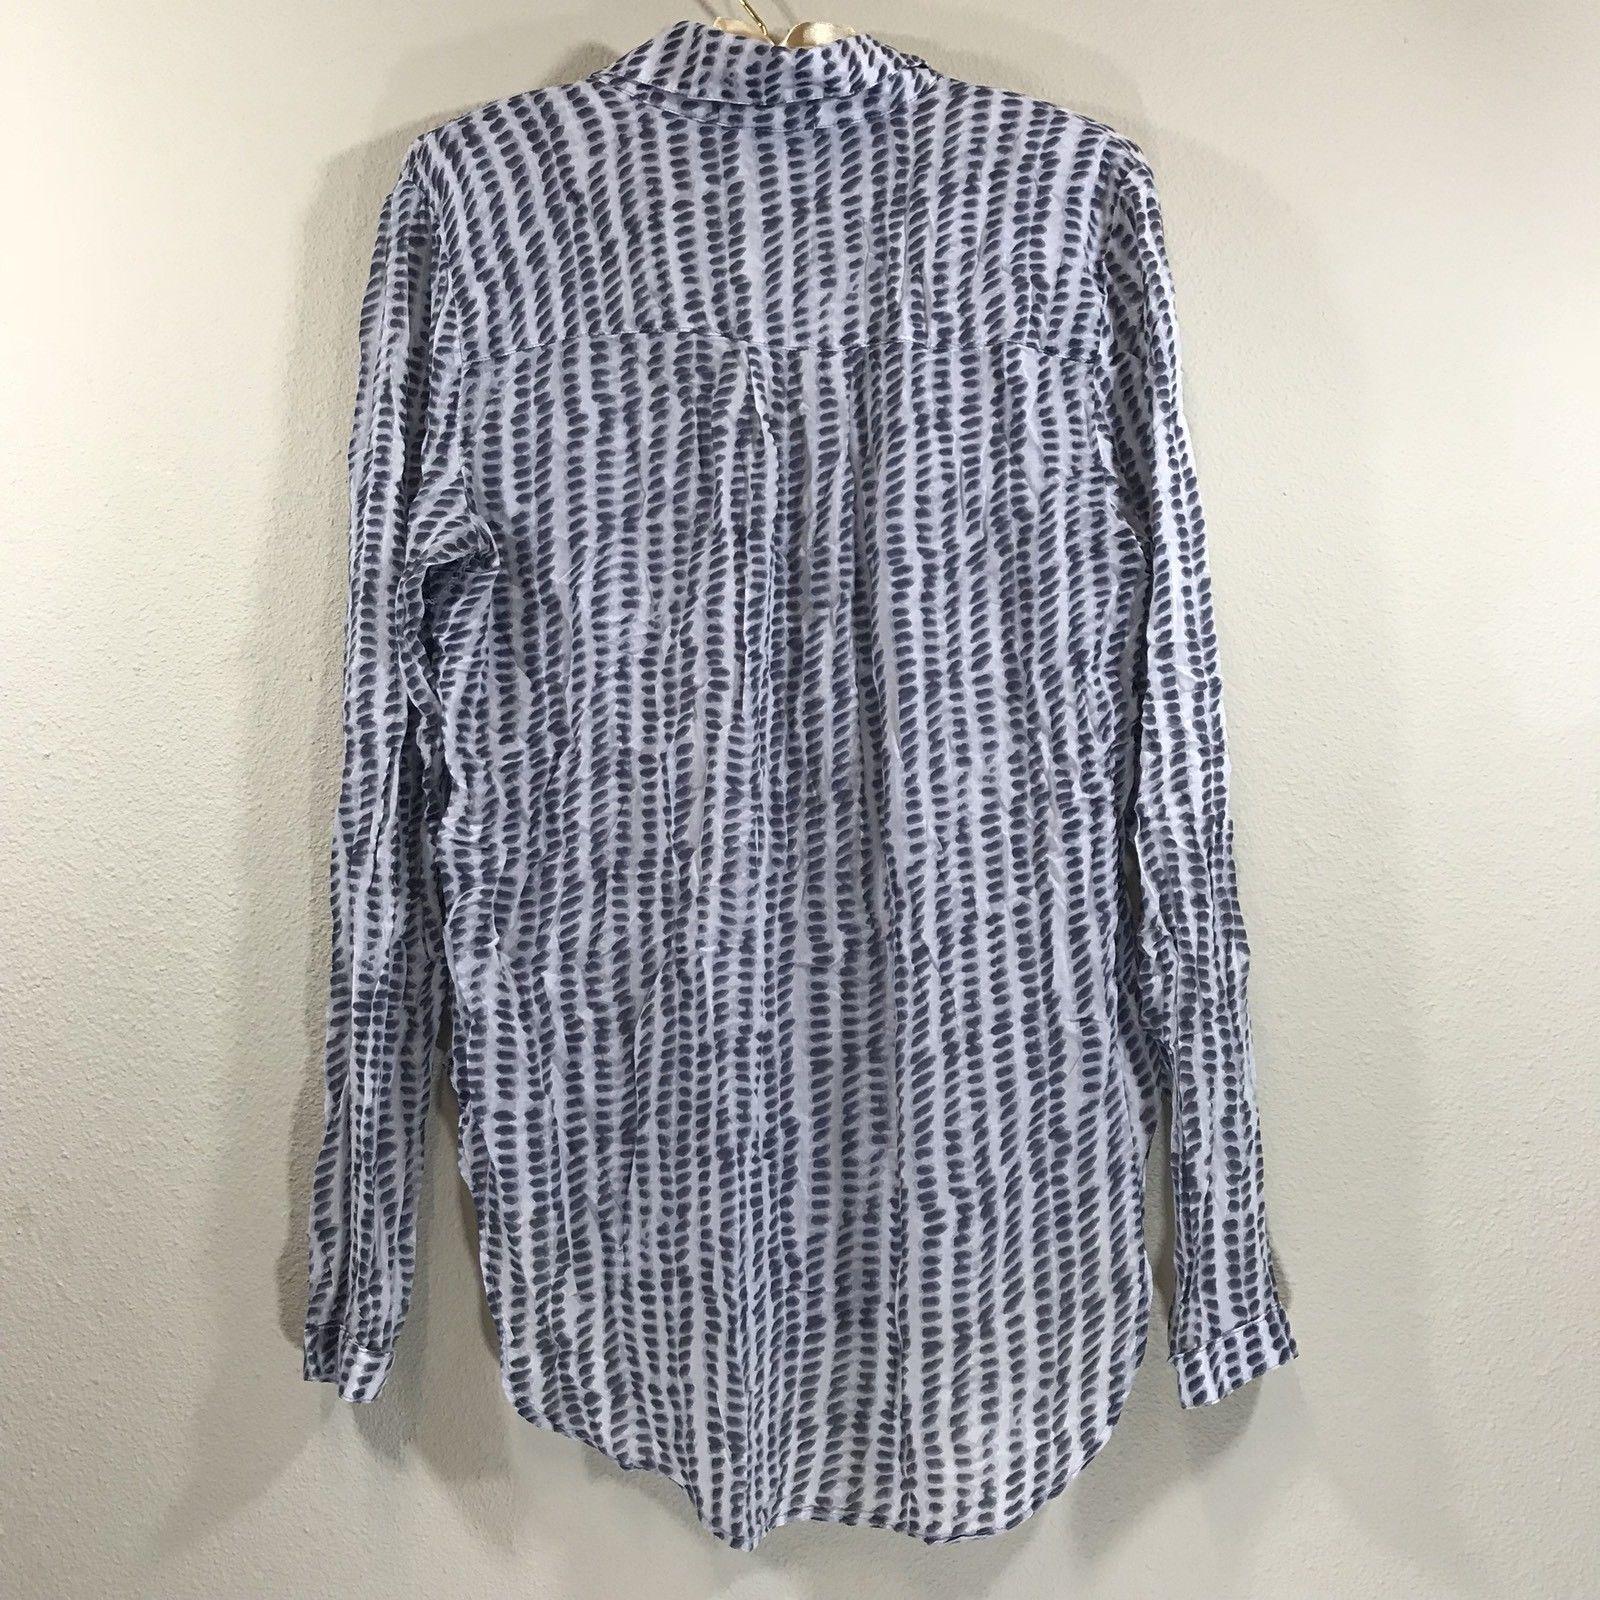 510c57c1695 Anthropologie Cloth & stone blue white hi low pocket buttondown top blouse  small